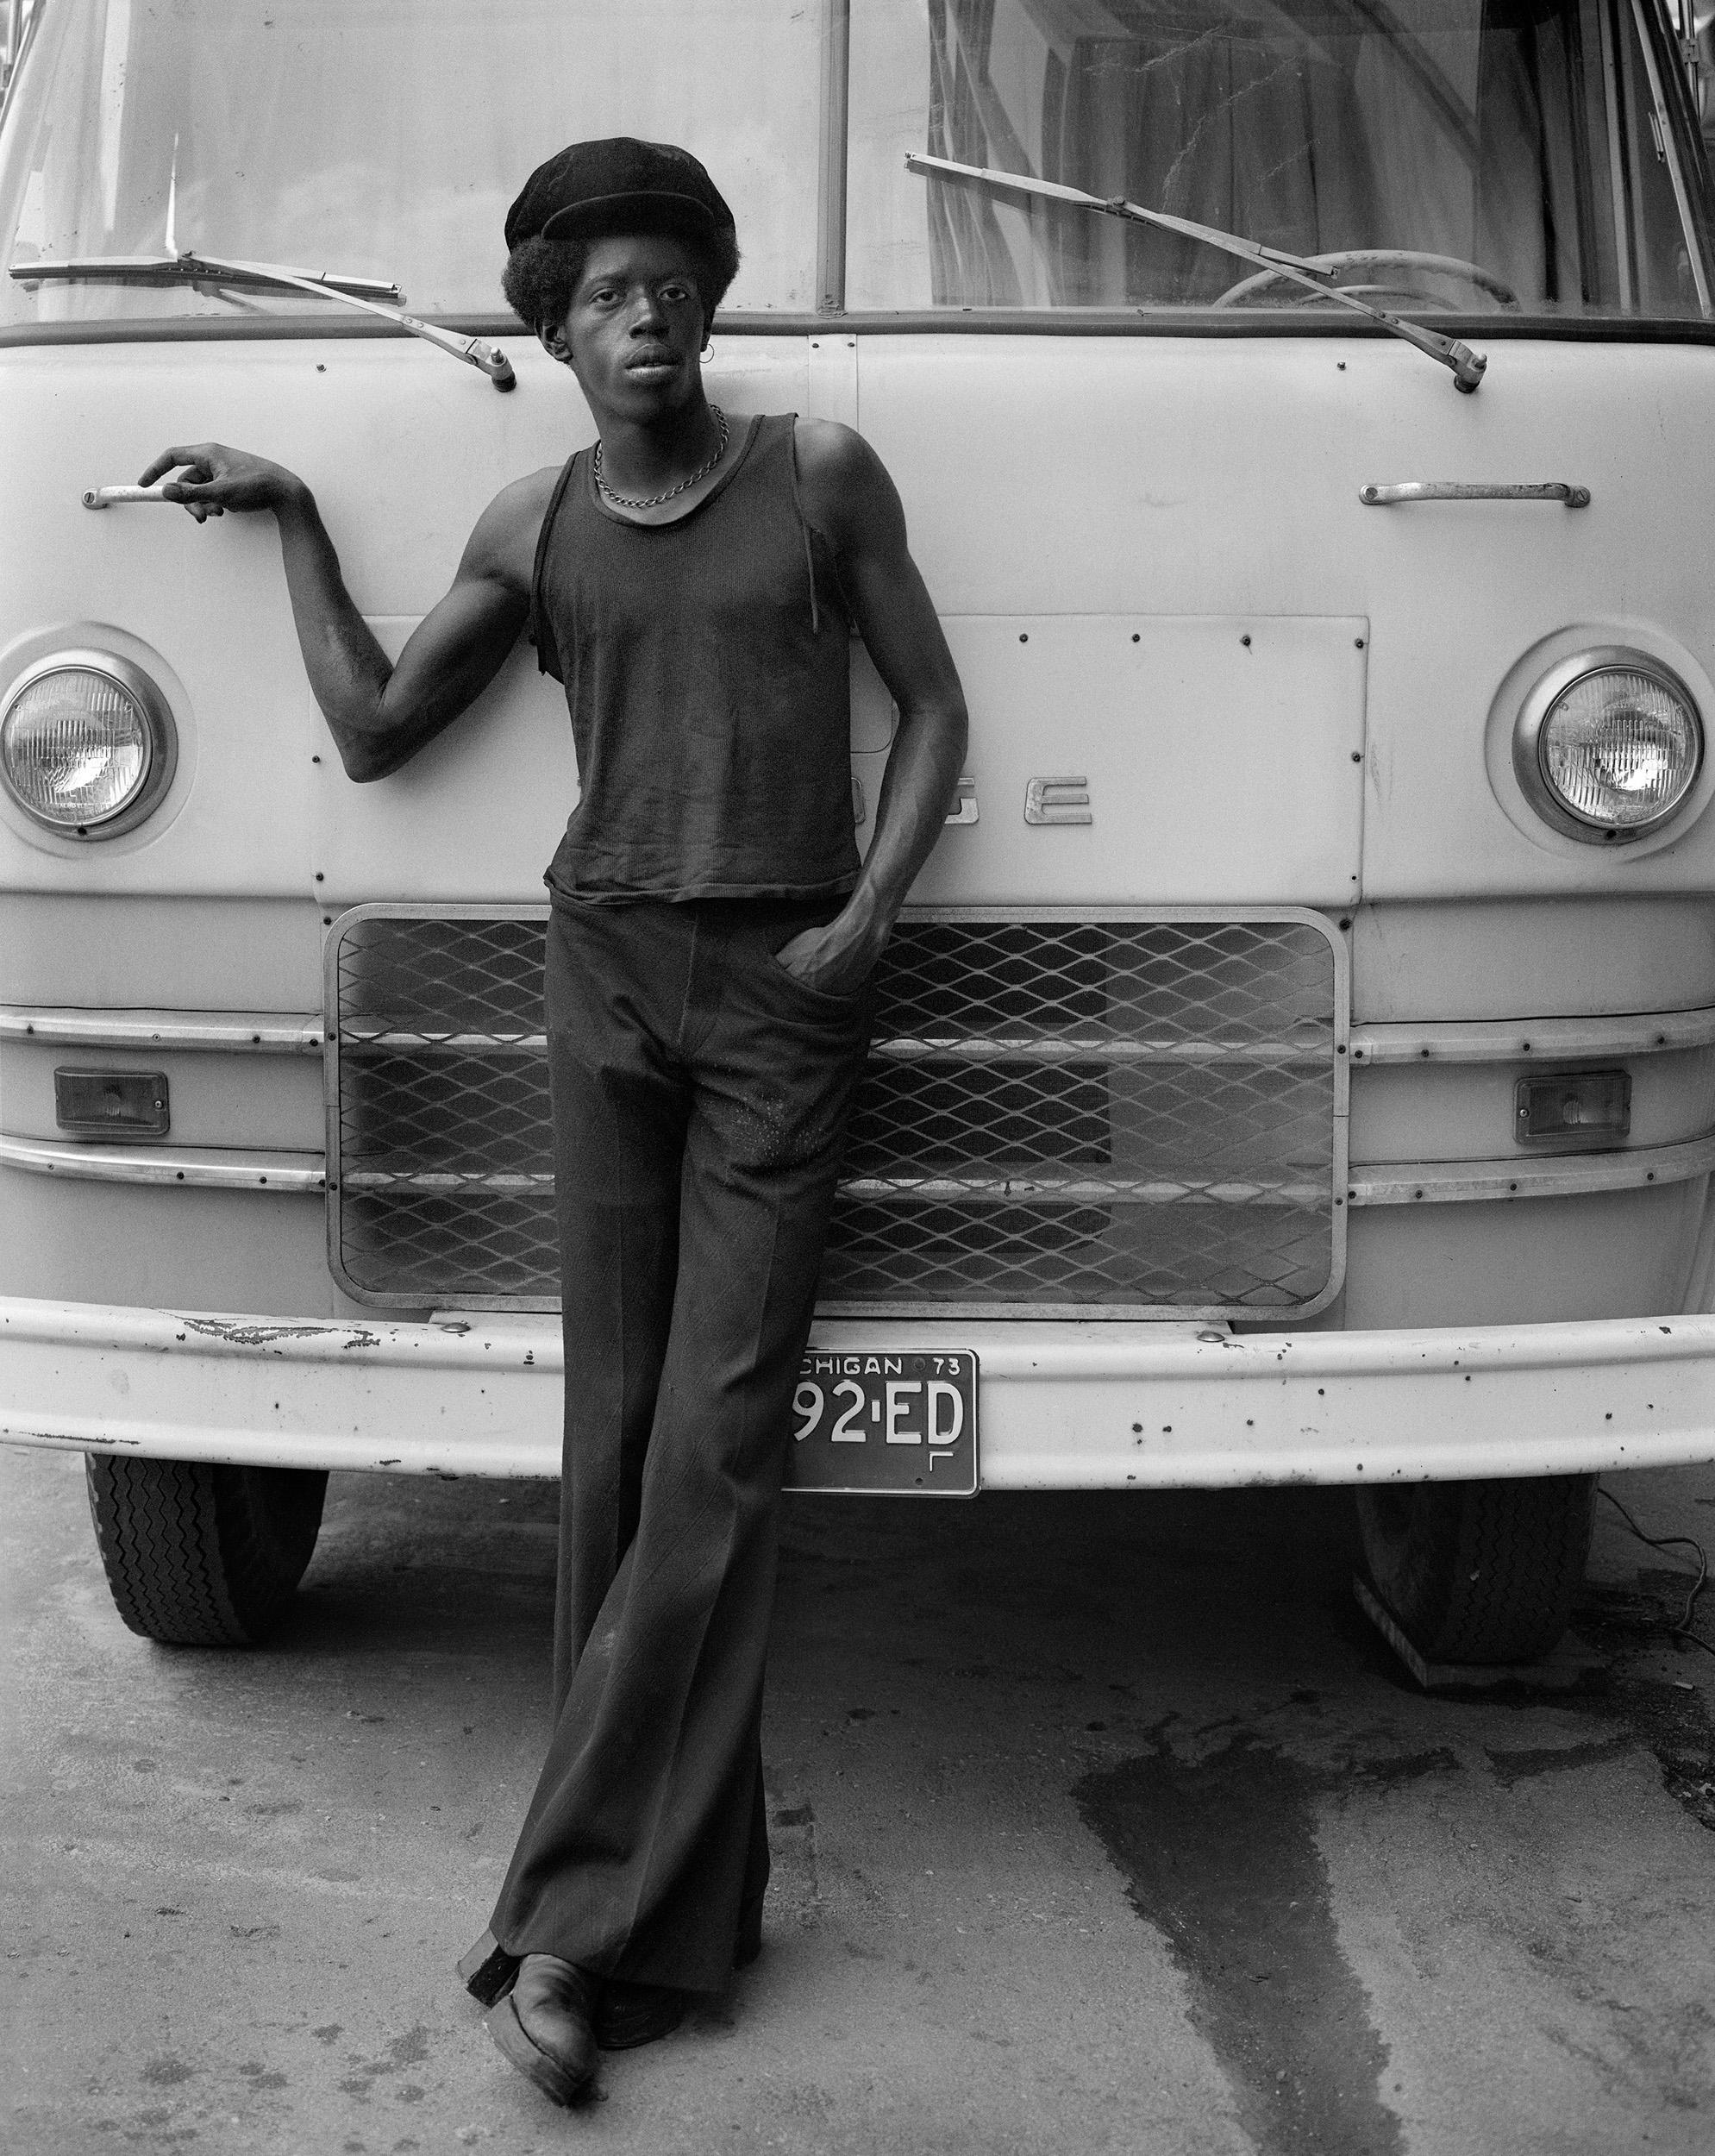 Jonnie, Detroit 1972, Detroit, Michigan, 1972